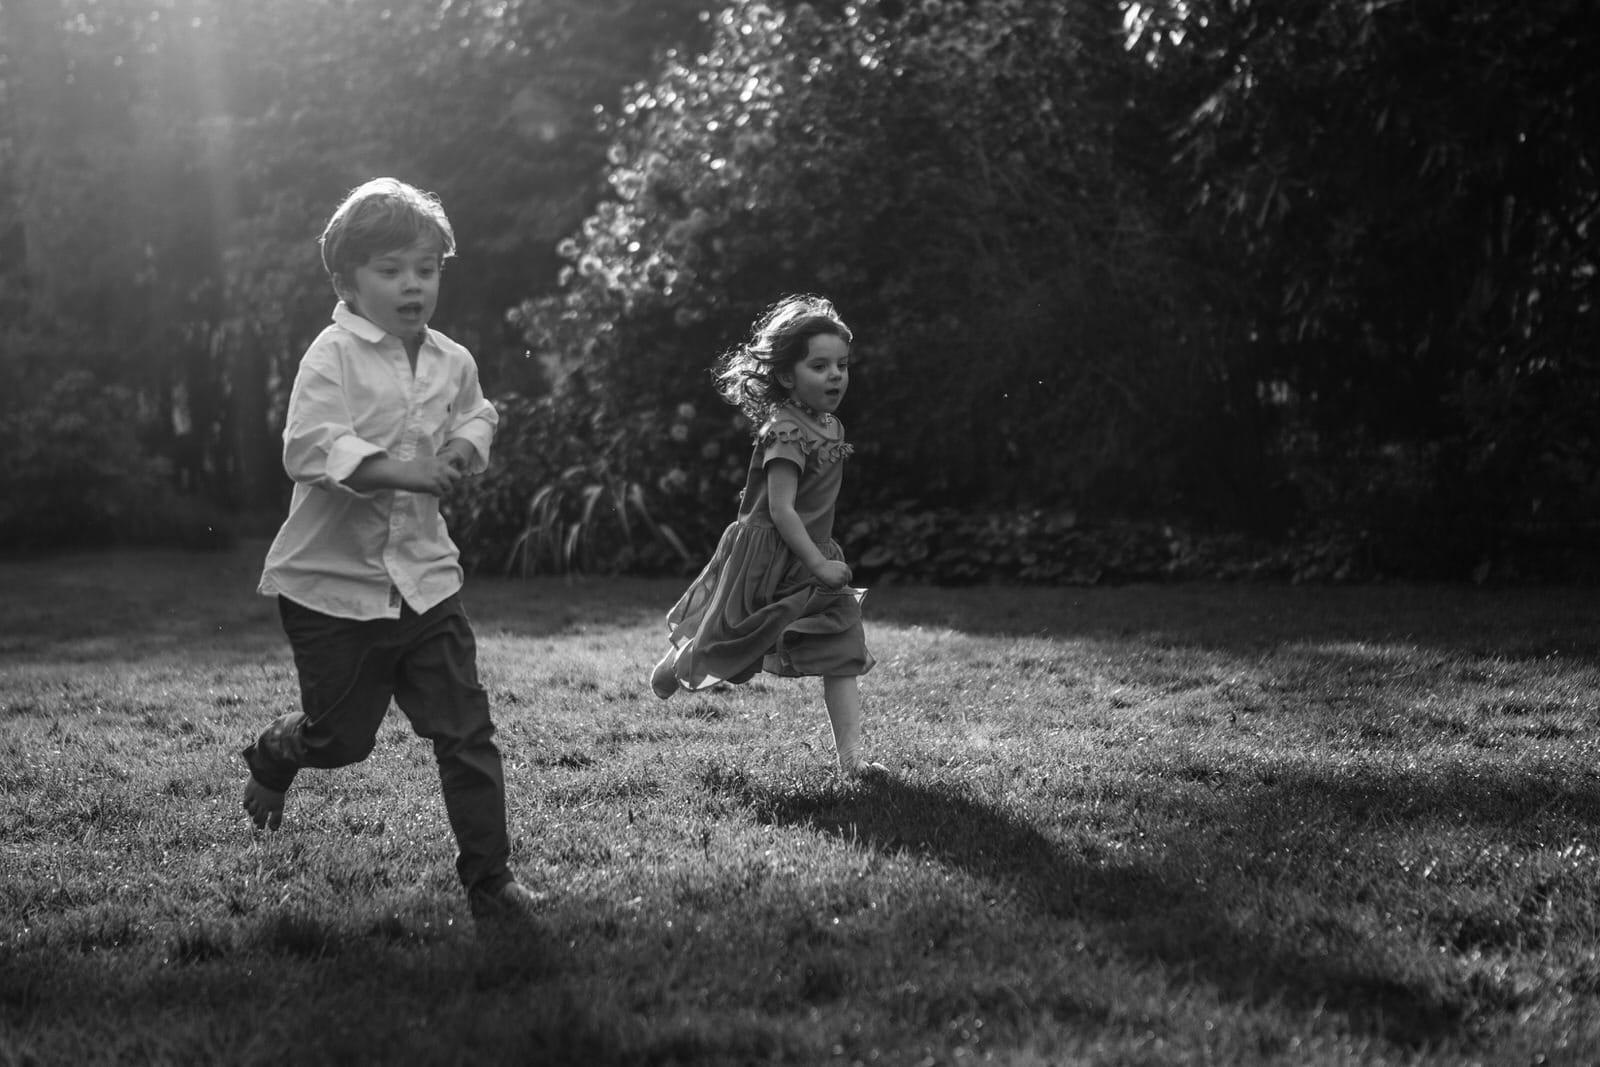 kensington-day-in-the-life-documentary-family-photographs-0164